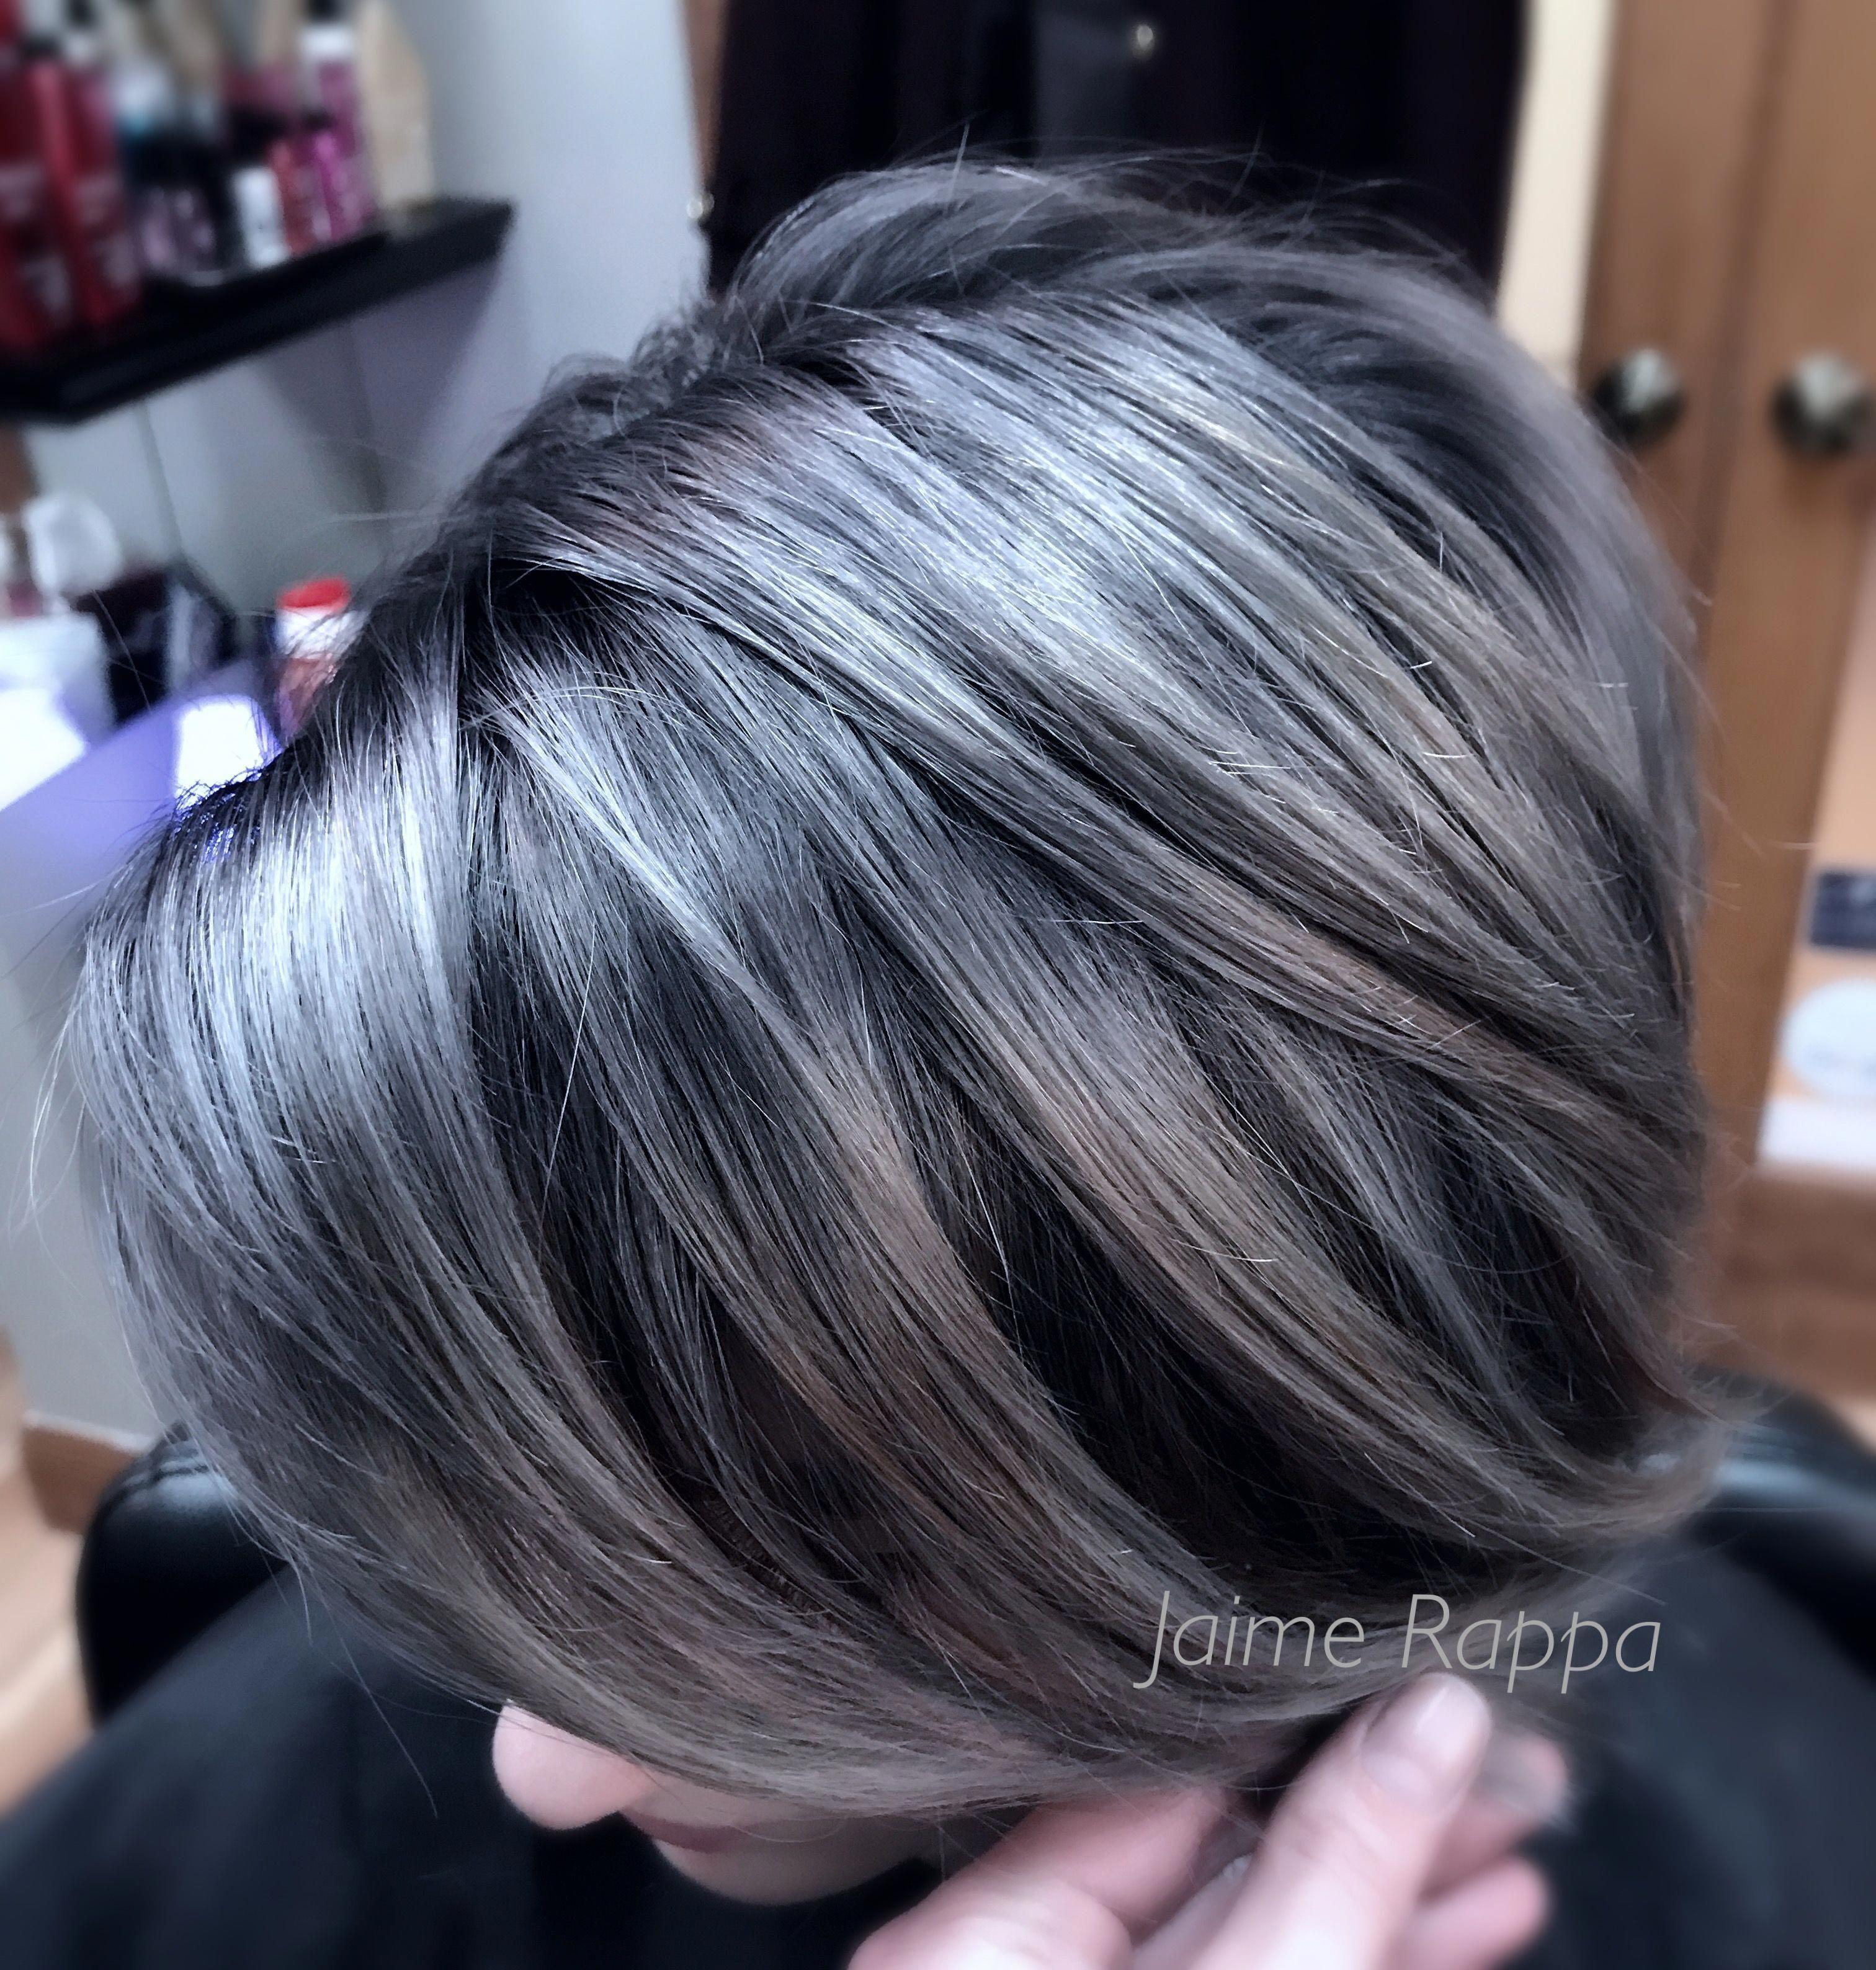 45 Ideas Of Gray And Silver Highlights On Brown Hair Grey Hair Color Silver Silver Hair Short Gray Hair Highlights